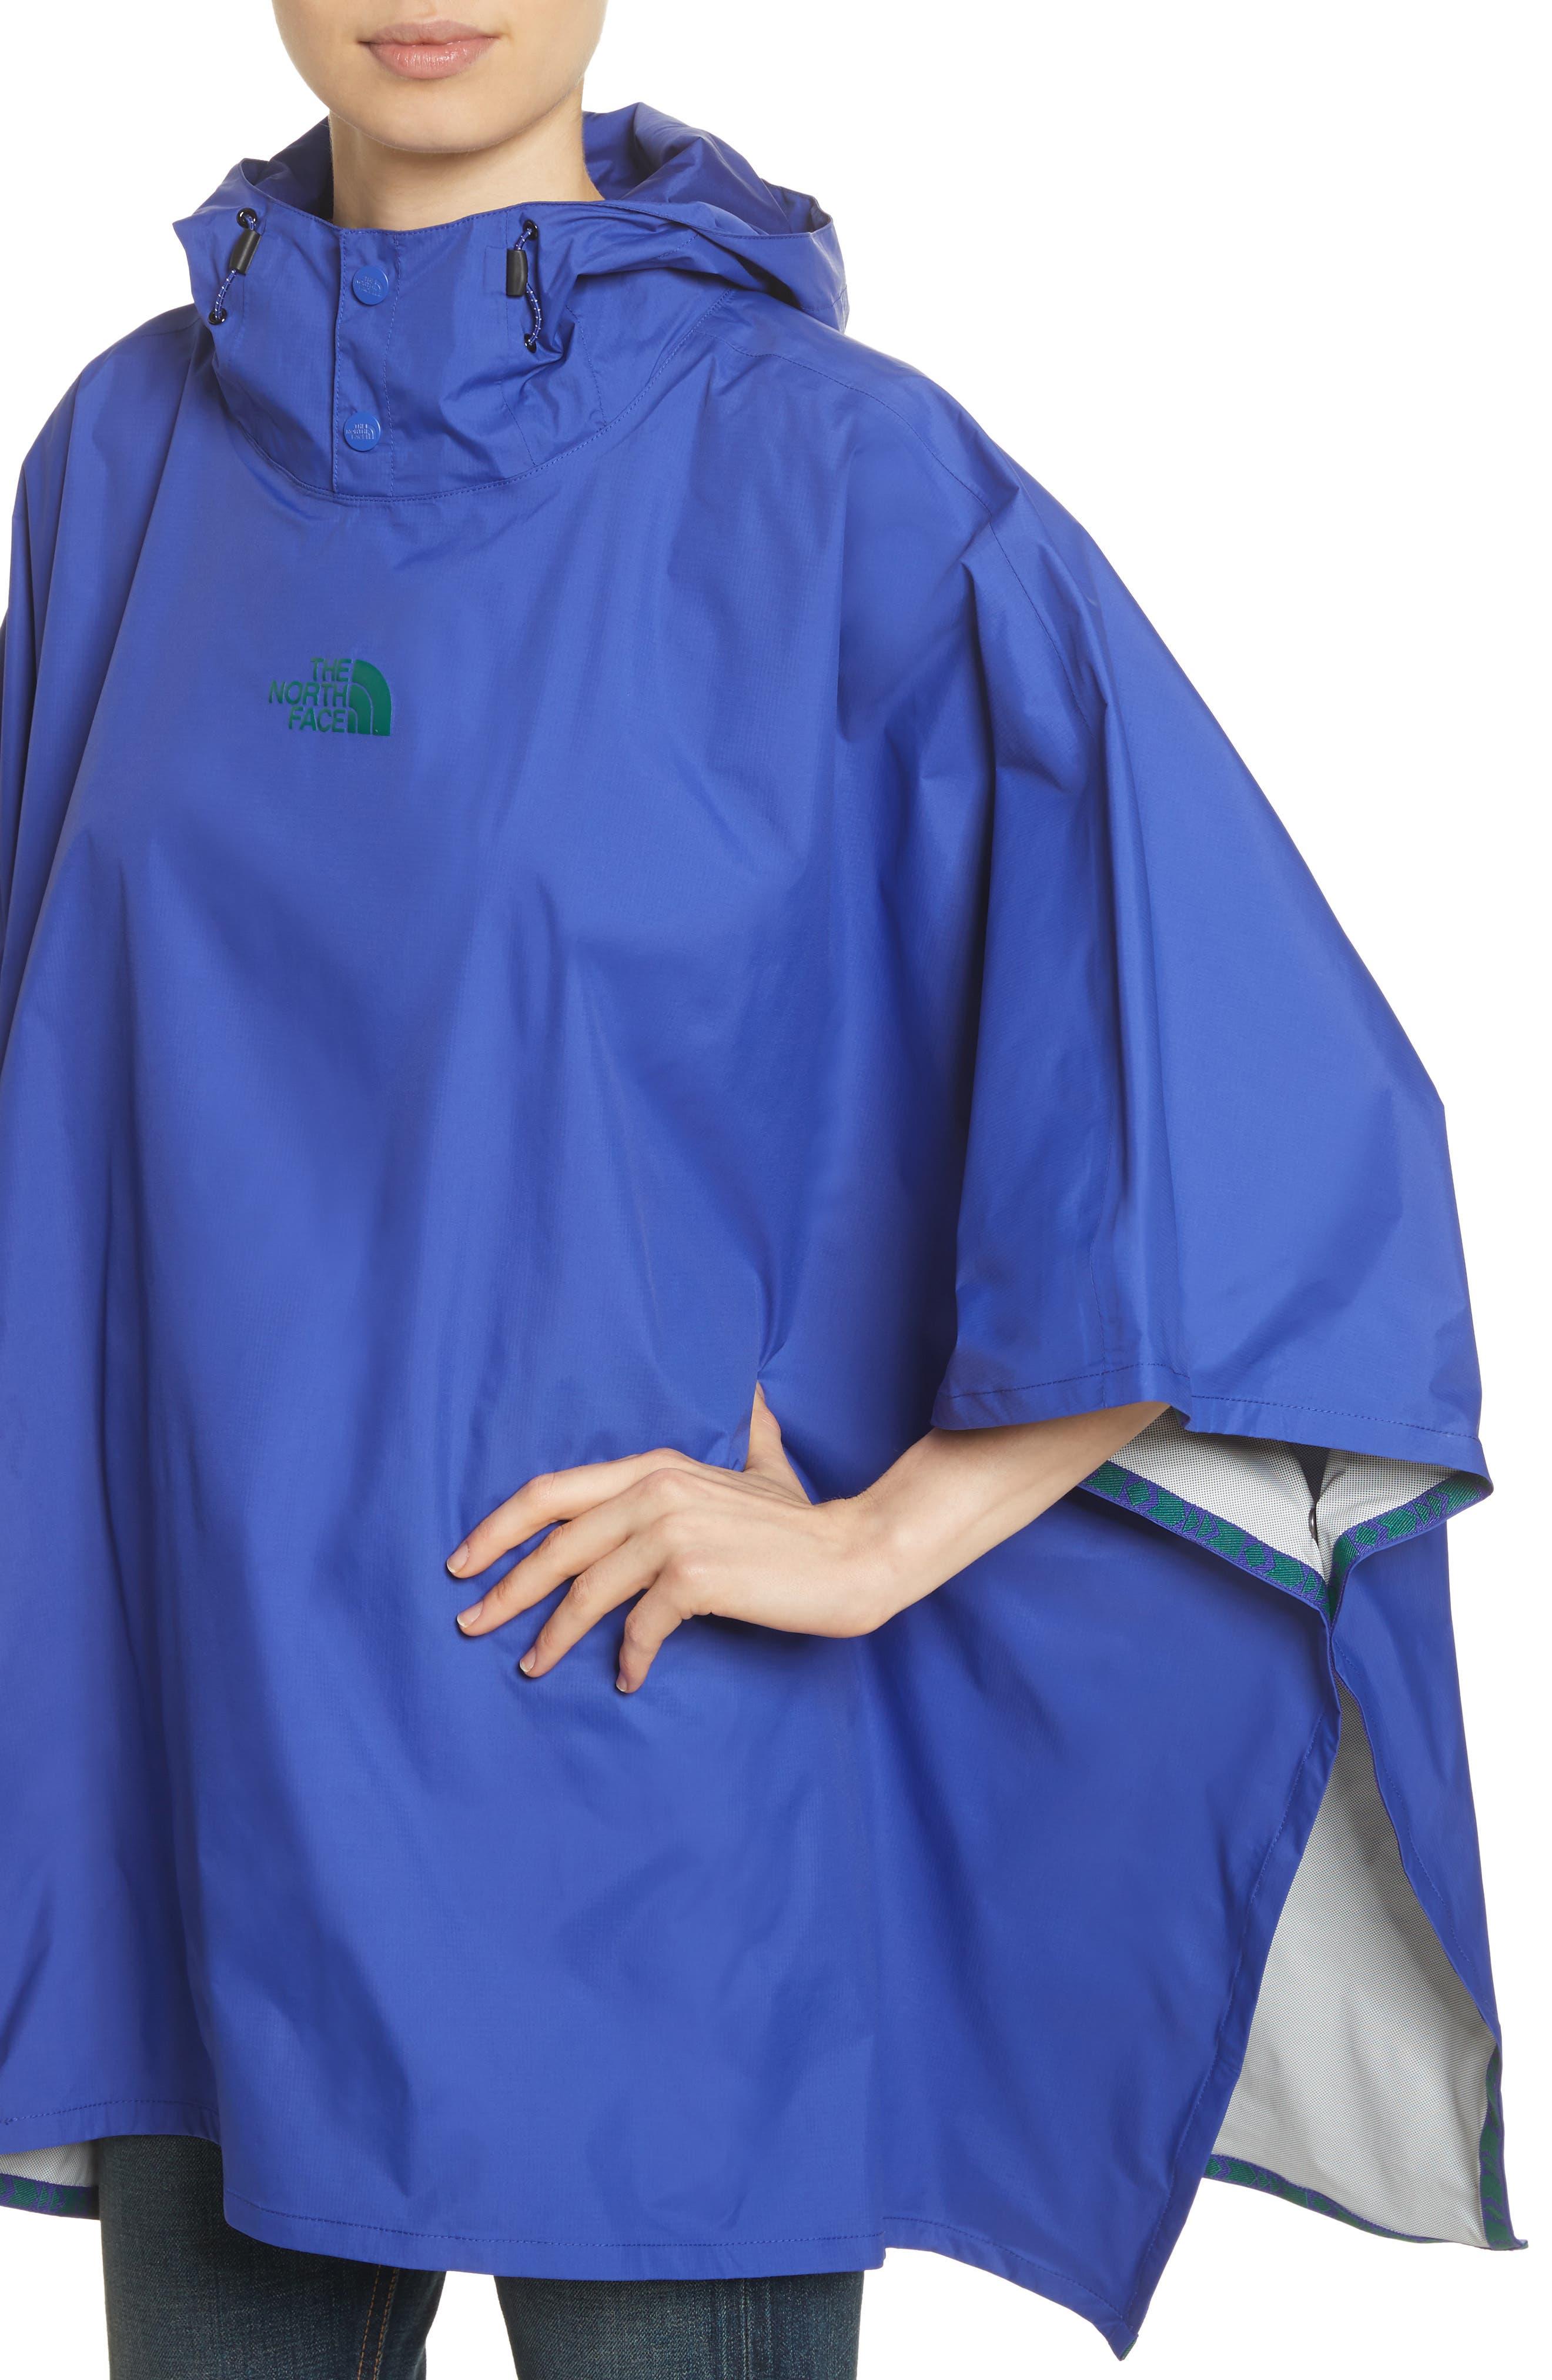 Unisex Rain Poncho,                             Alternate thumbnail 5, color,                             Lapis Blue